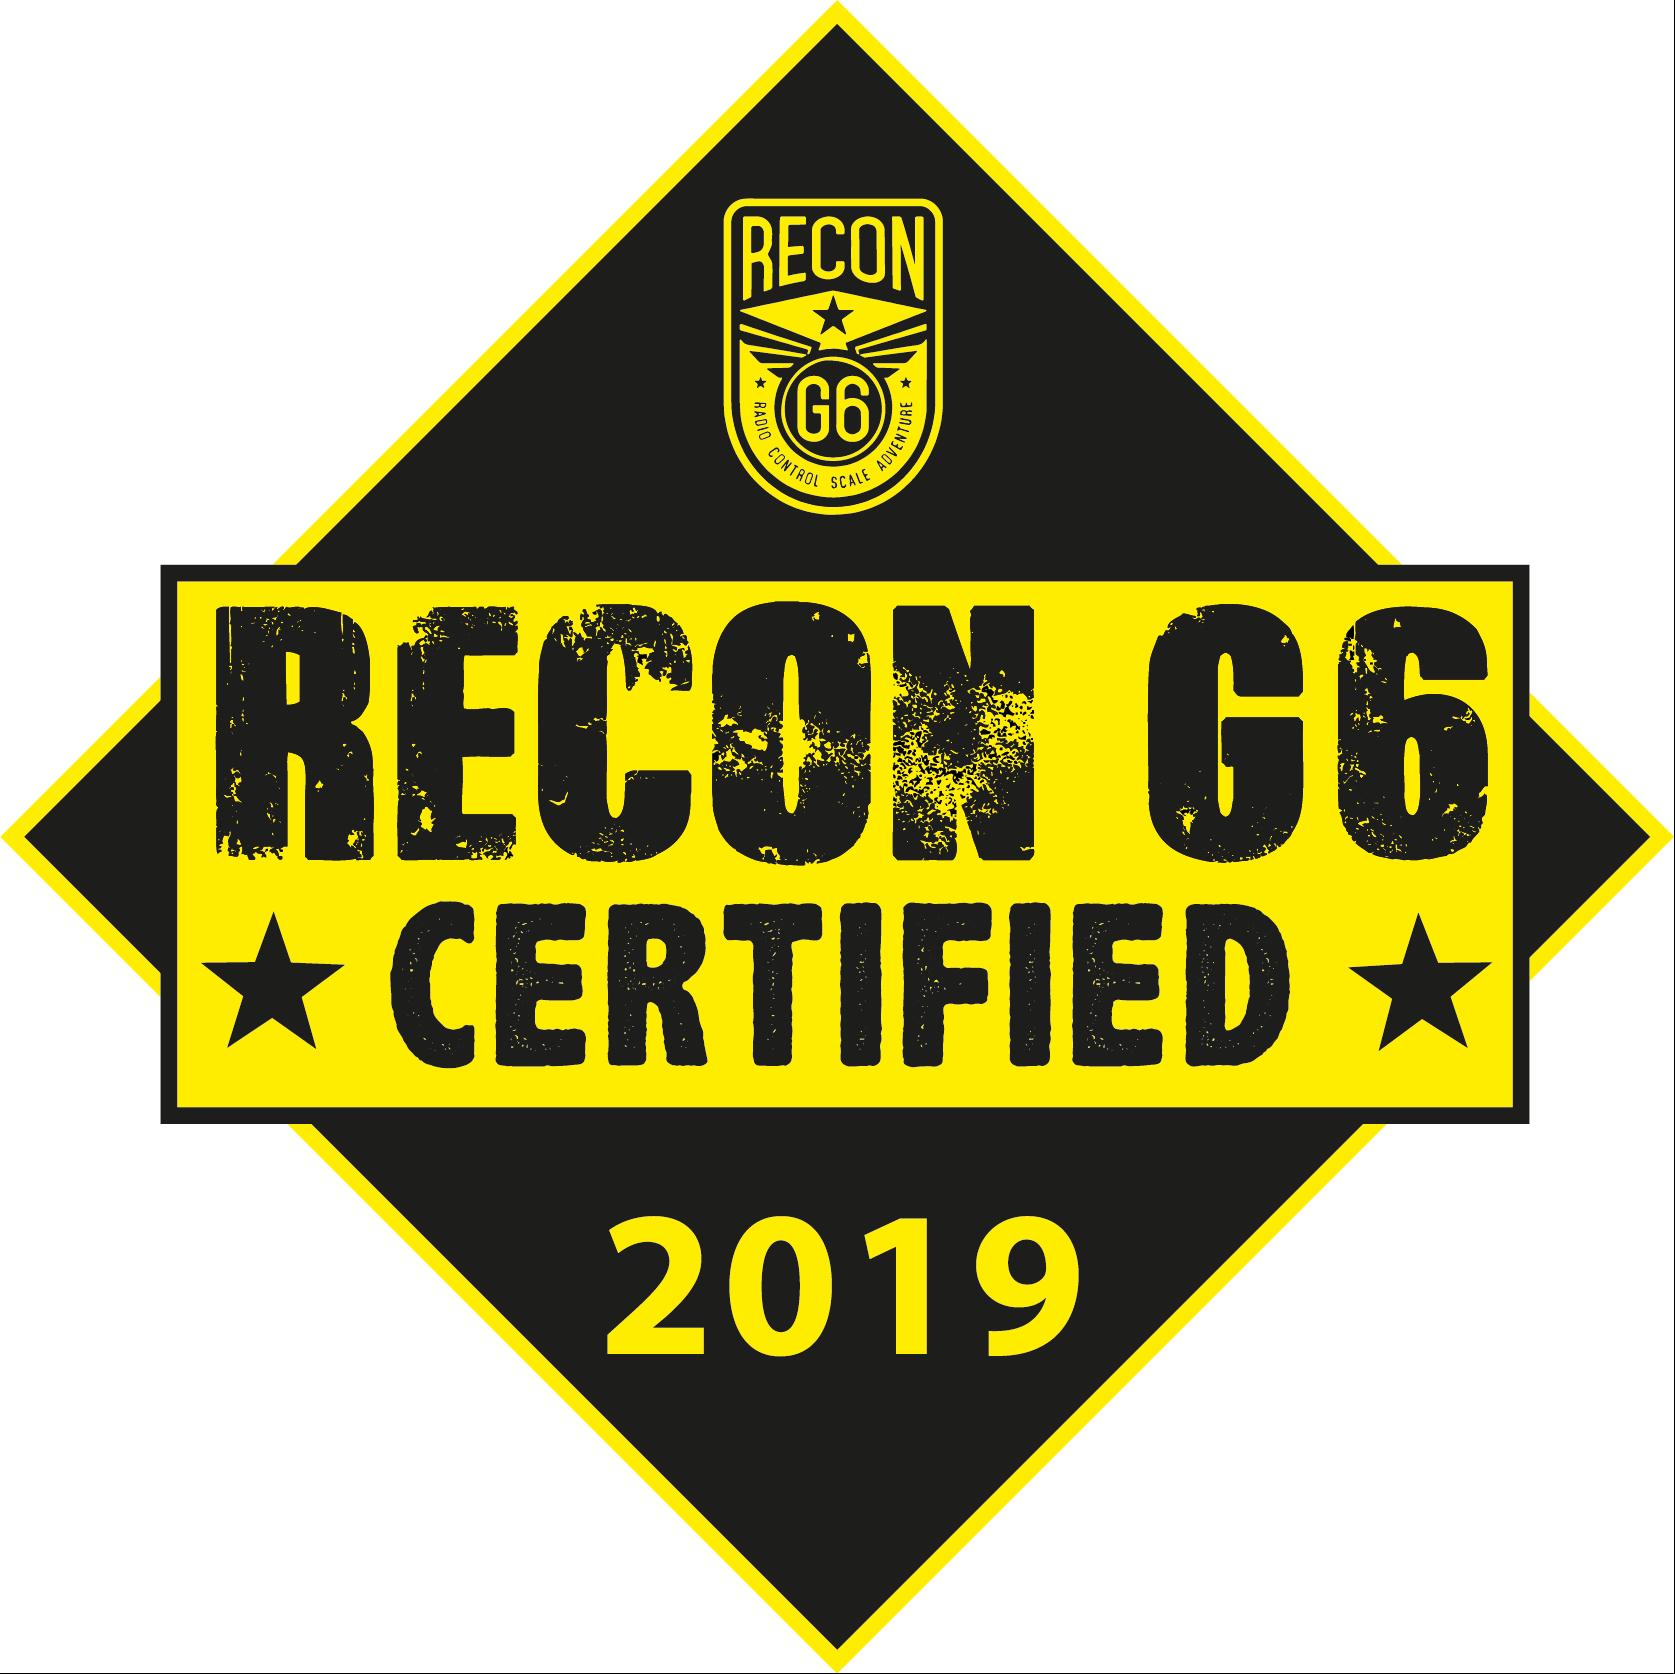 Recong G6 Certified 2019